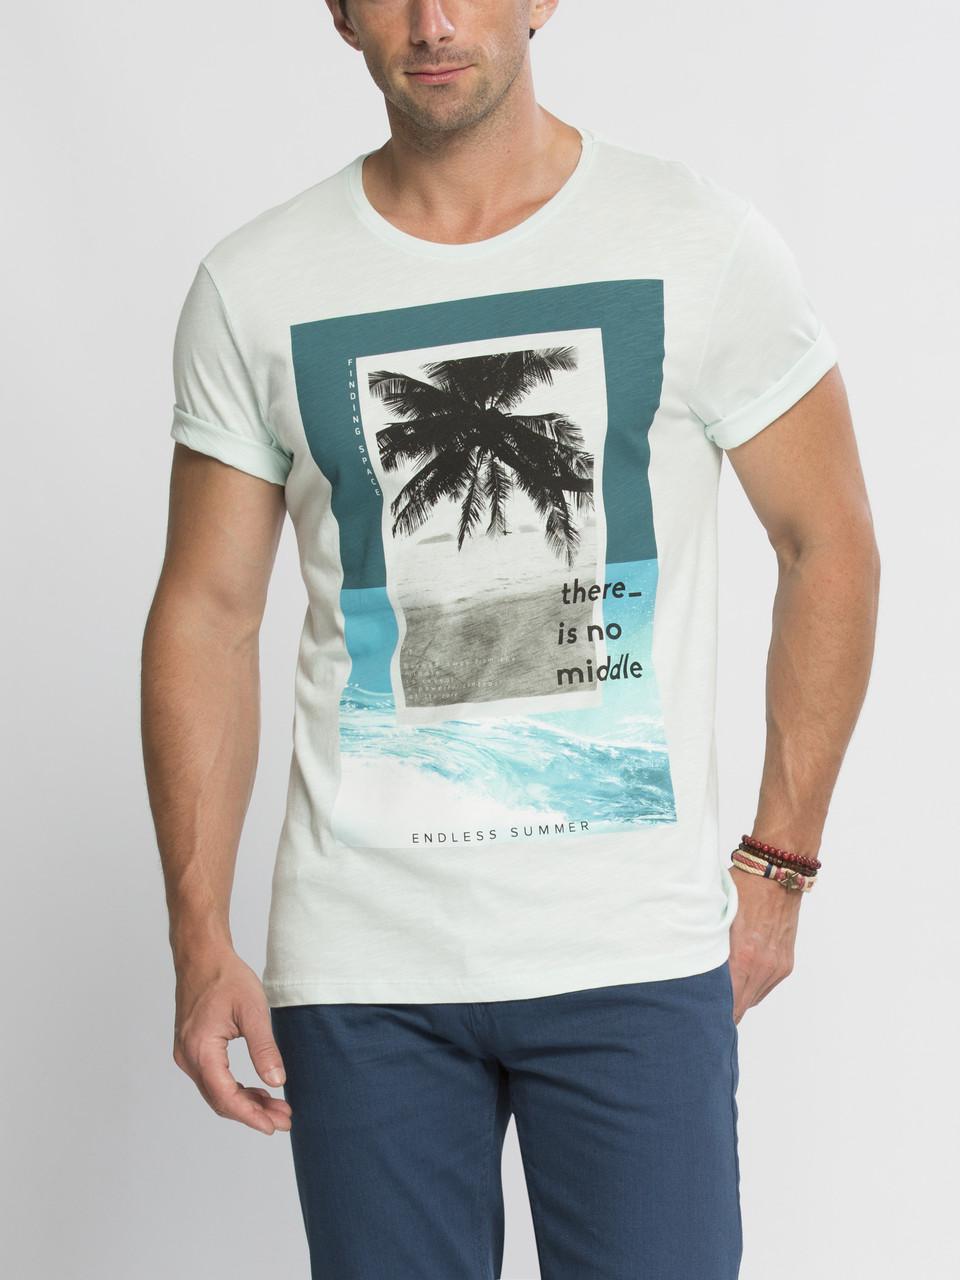 Мужская футболка мятная LC Waikiki / ЛС Вайкики с пальмой на груди, фото 1